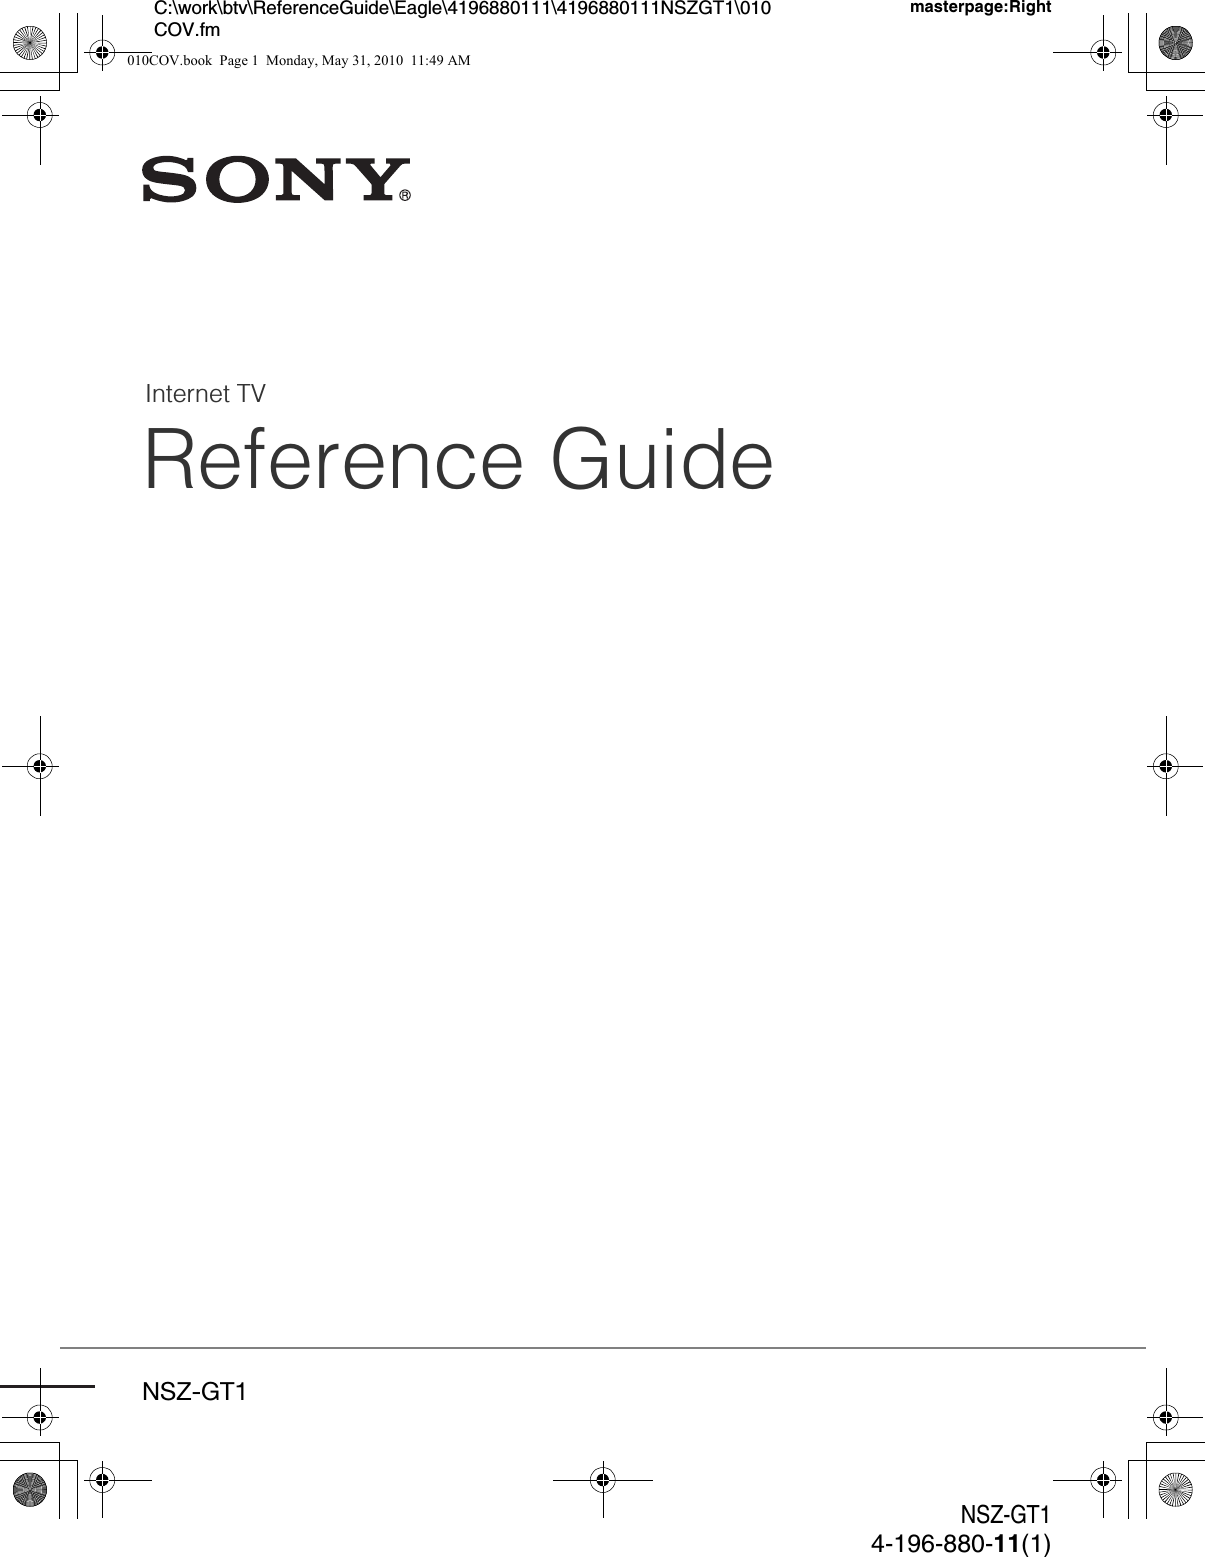 sony nszgt1 internet tv box user manual nsz gt1 reference guide rh usermanual wiki Sony Google TV Box Internet Sony Internet TV Player